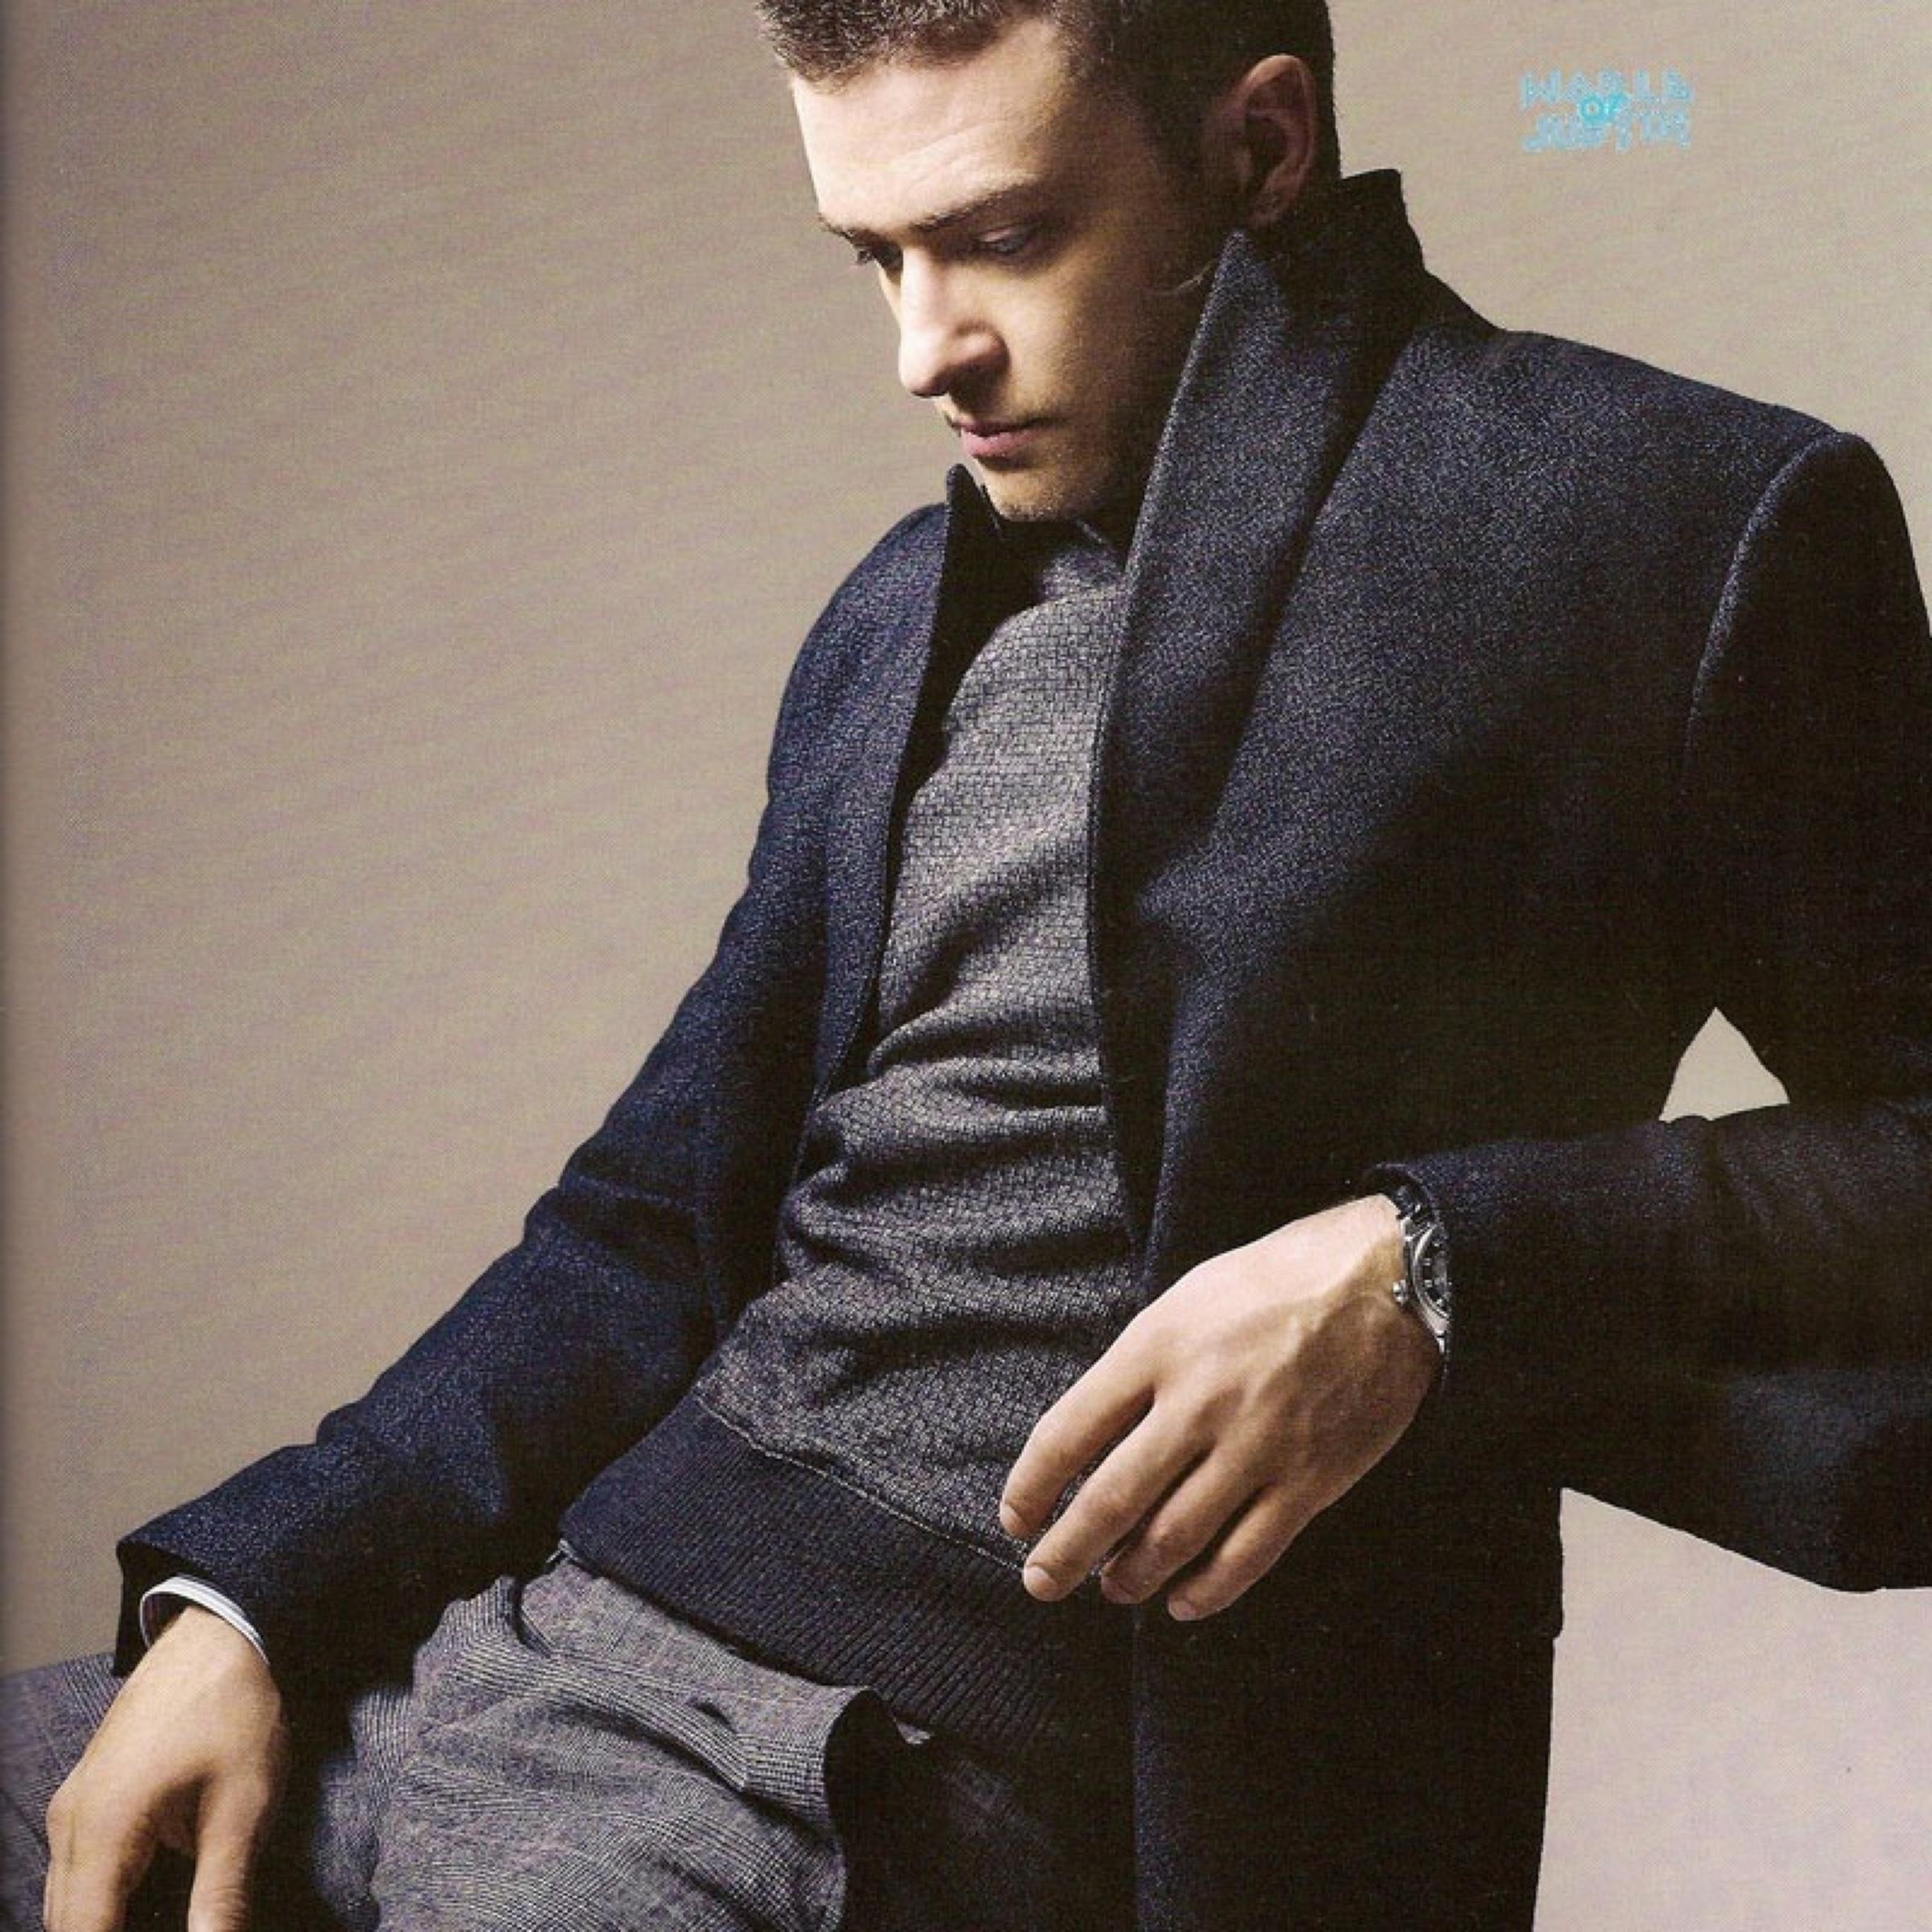 #3 (143 likes) :: Justin Timberlake